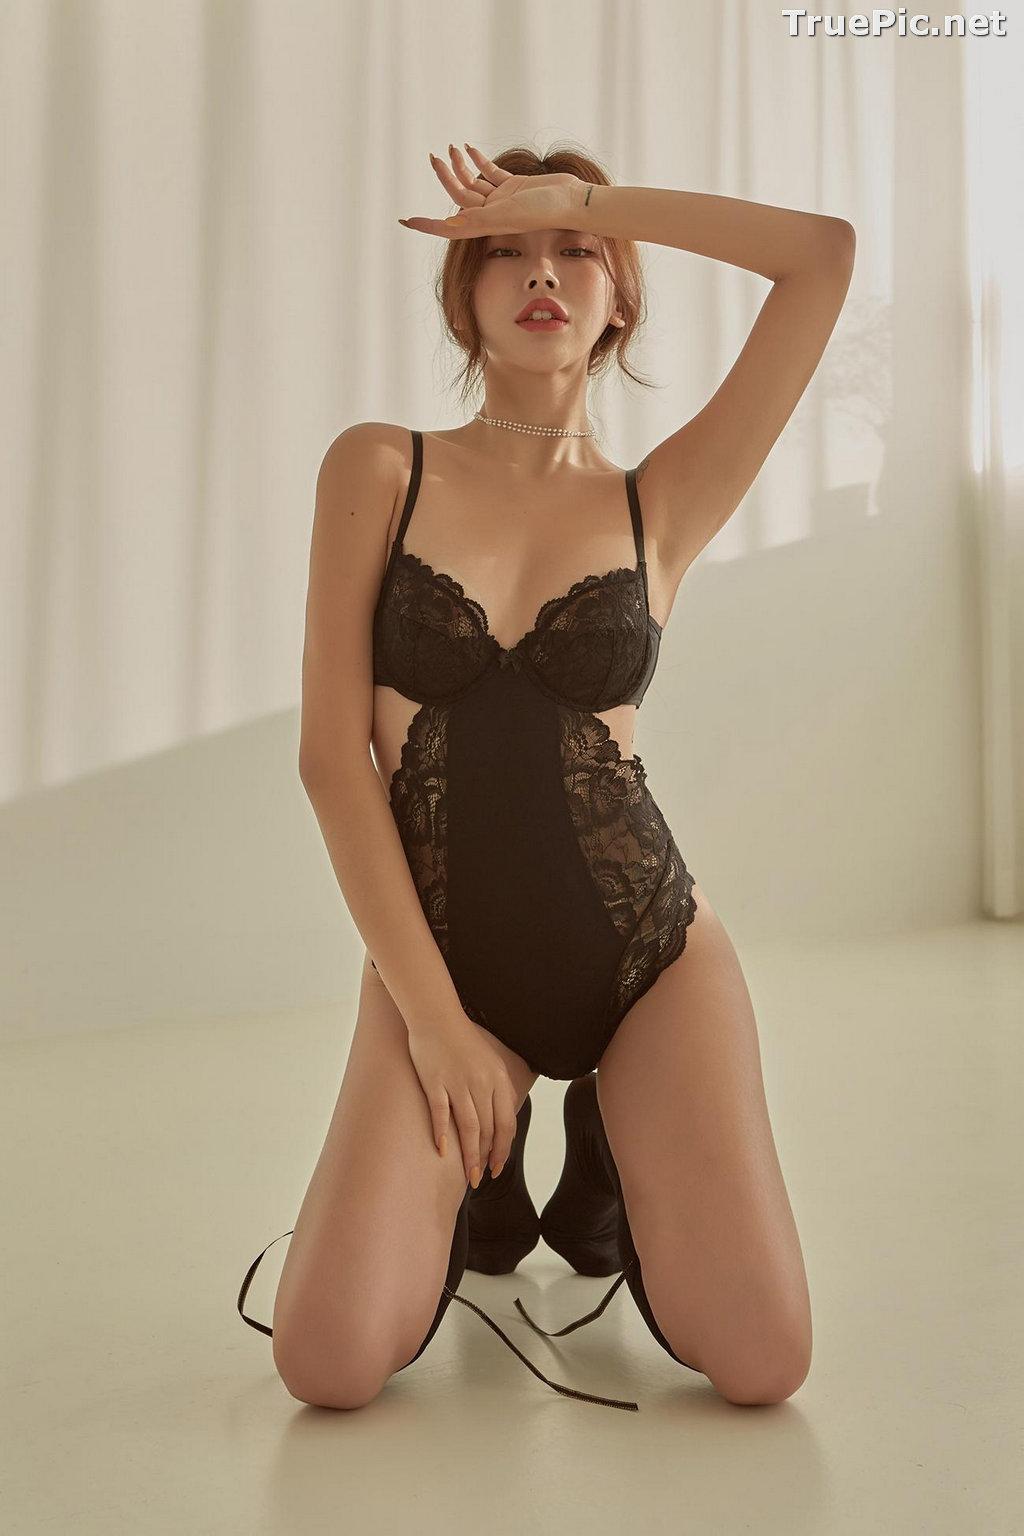 Image Korean Fashion Model - Da Yomi (다요미) - Lountess Spring Lingerie #1 - TruePic.net - Picture-7